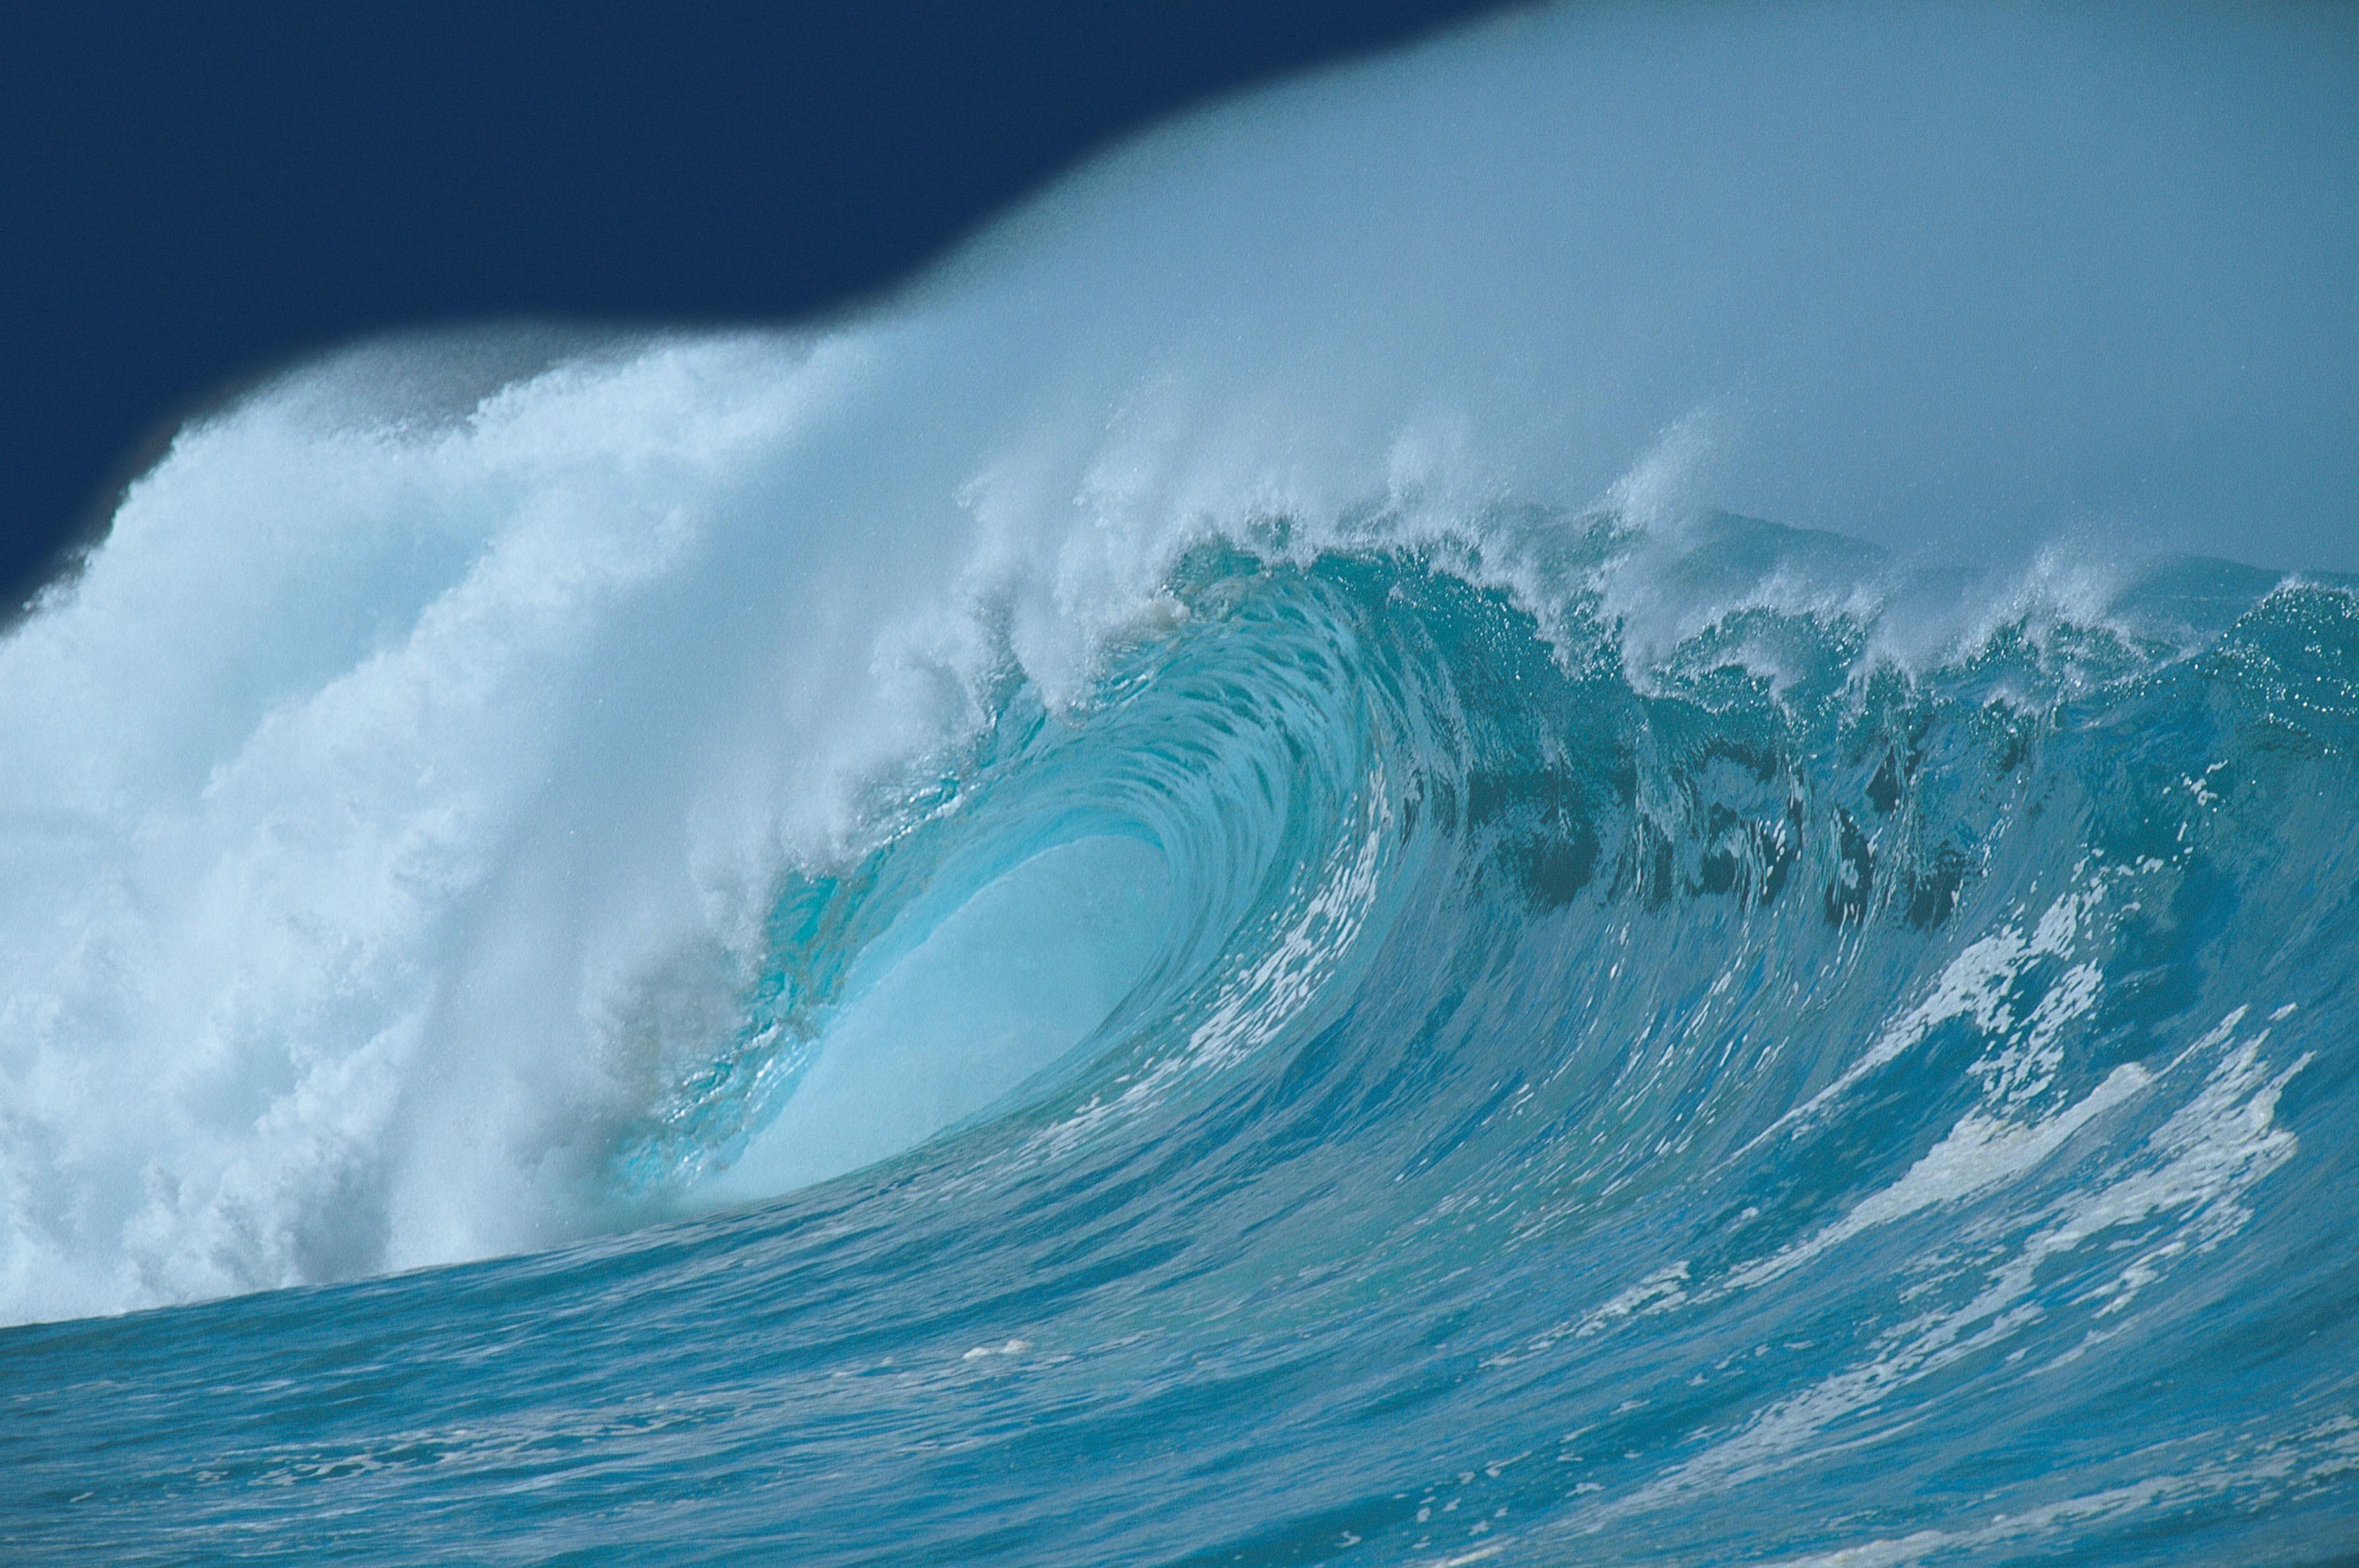 Water ocean waves desktop  X  hd Wallpaper 3586x2384